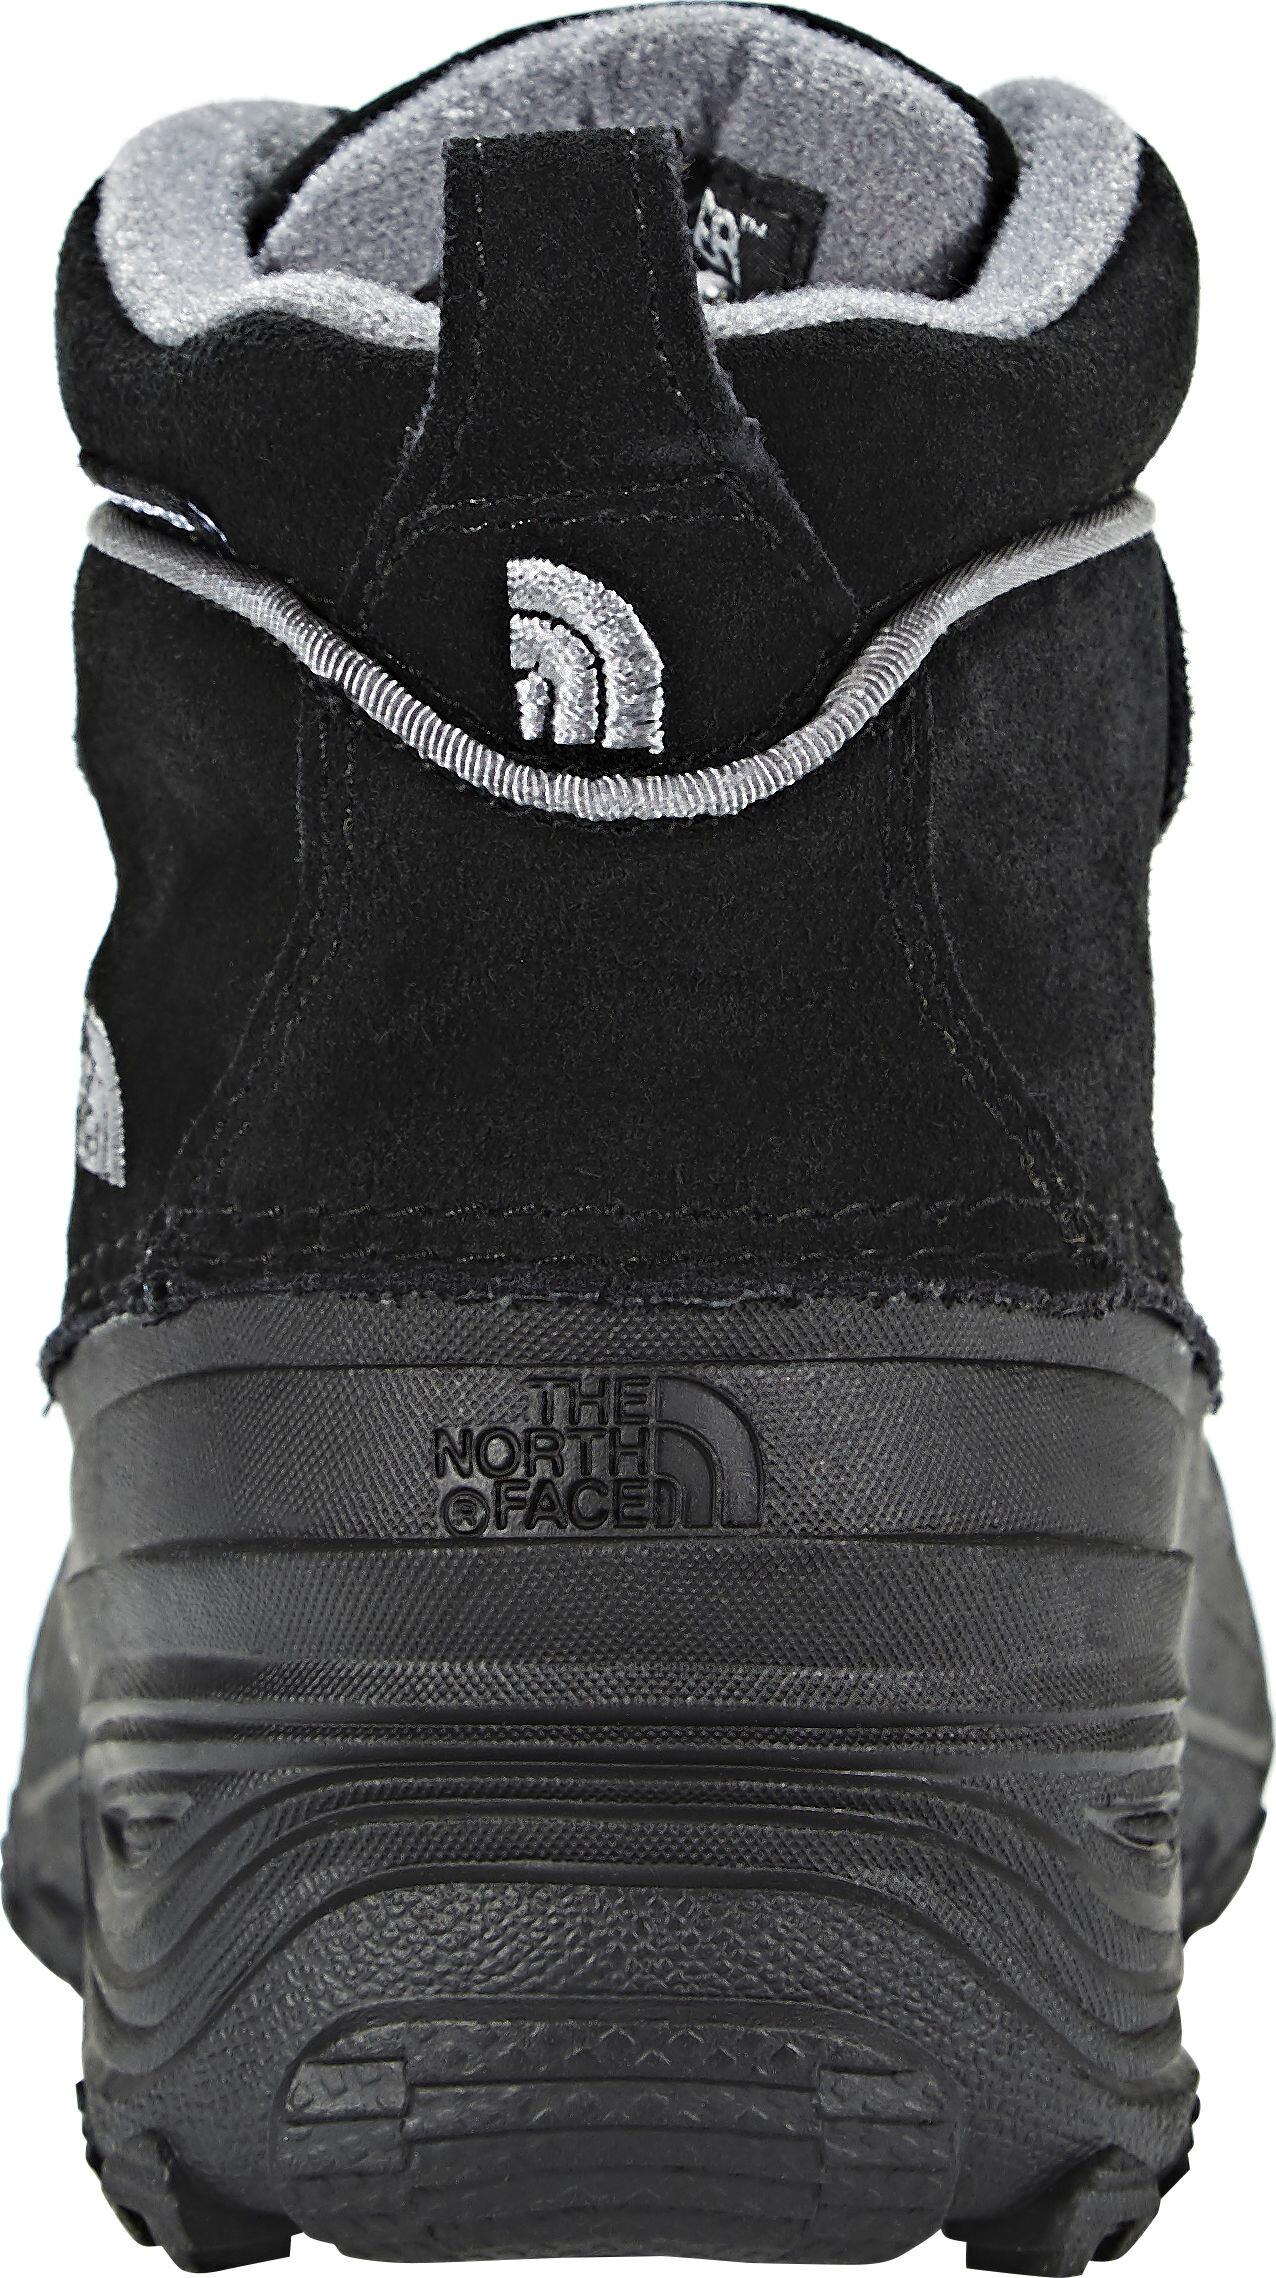 f5f617074 The North Face Chilkat Lace II Boots Kids tnf black/zinc grey